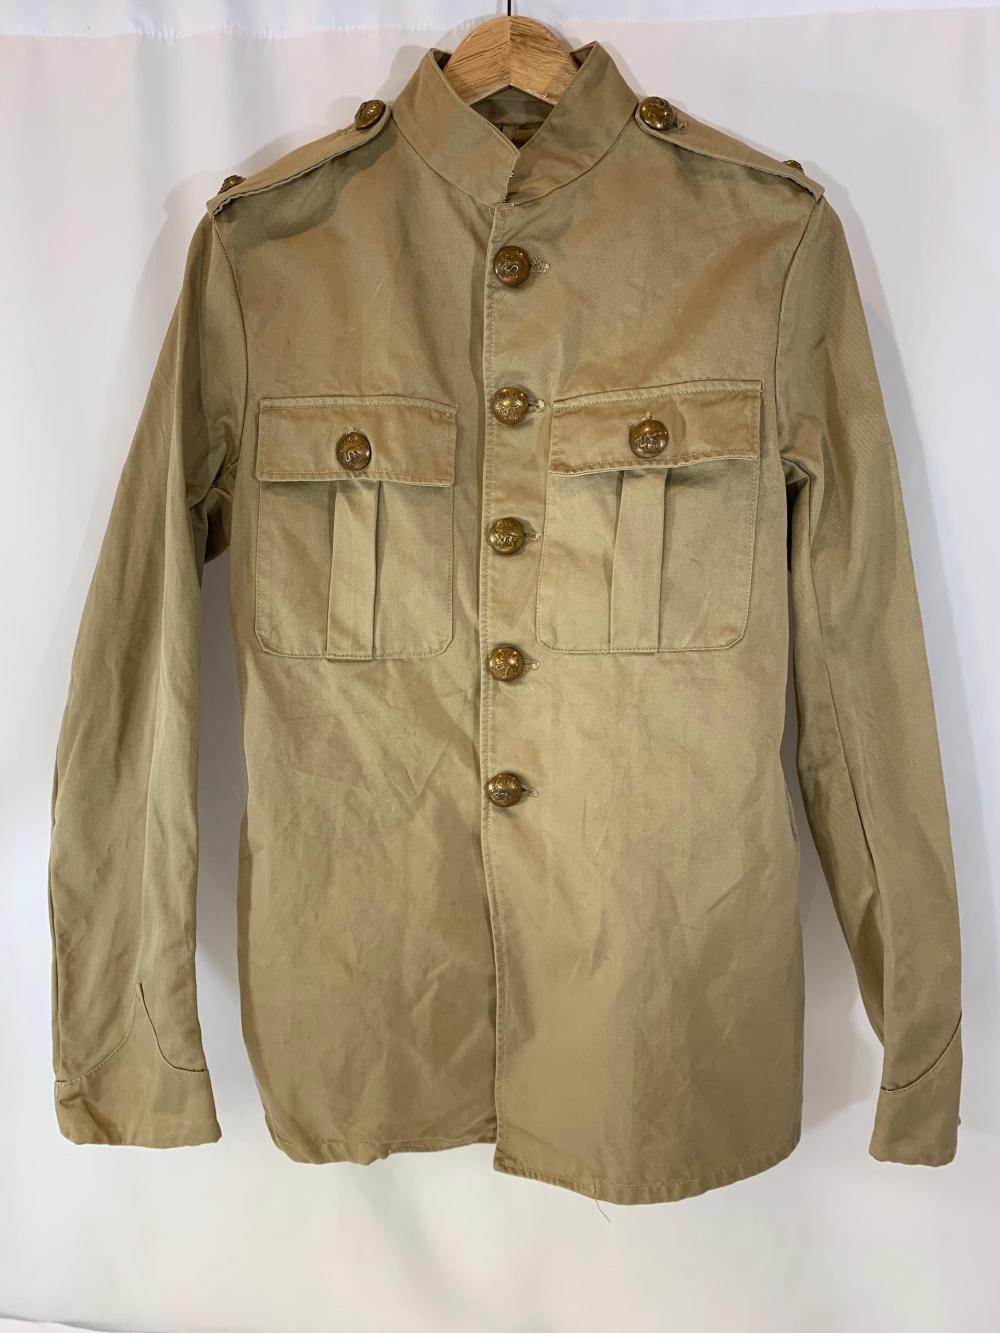 Rare British China Service Jacket